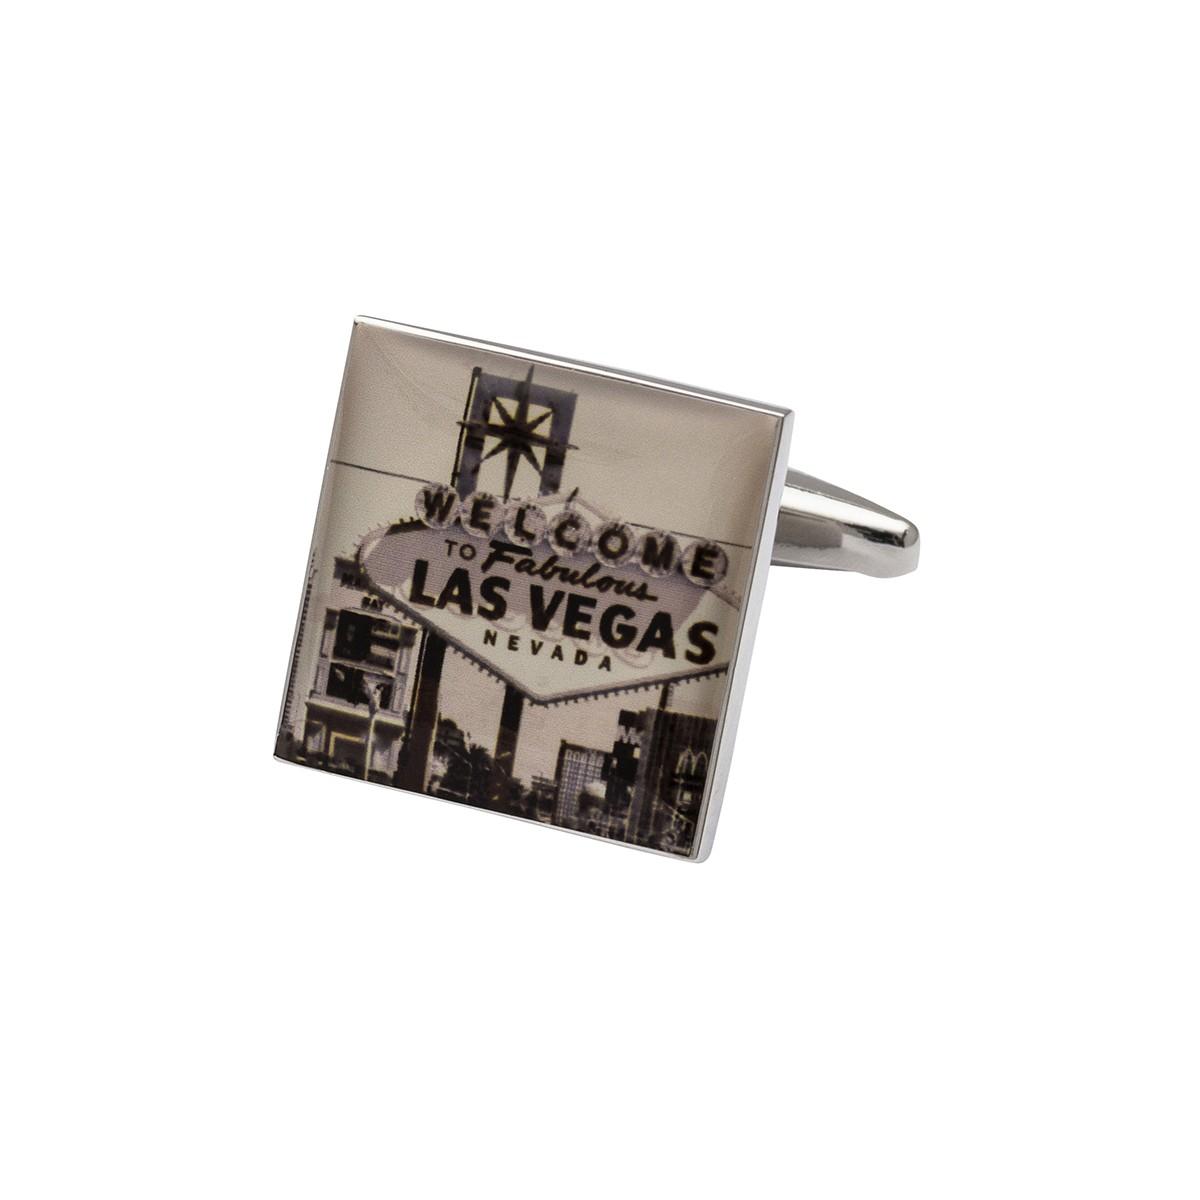 Las Vegas Cufflinks   Retro Nevada Cufflinks   Gambling Cufflinks